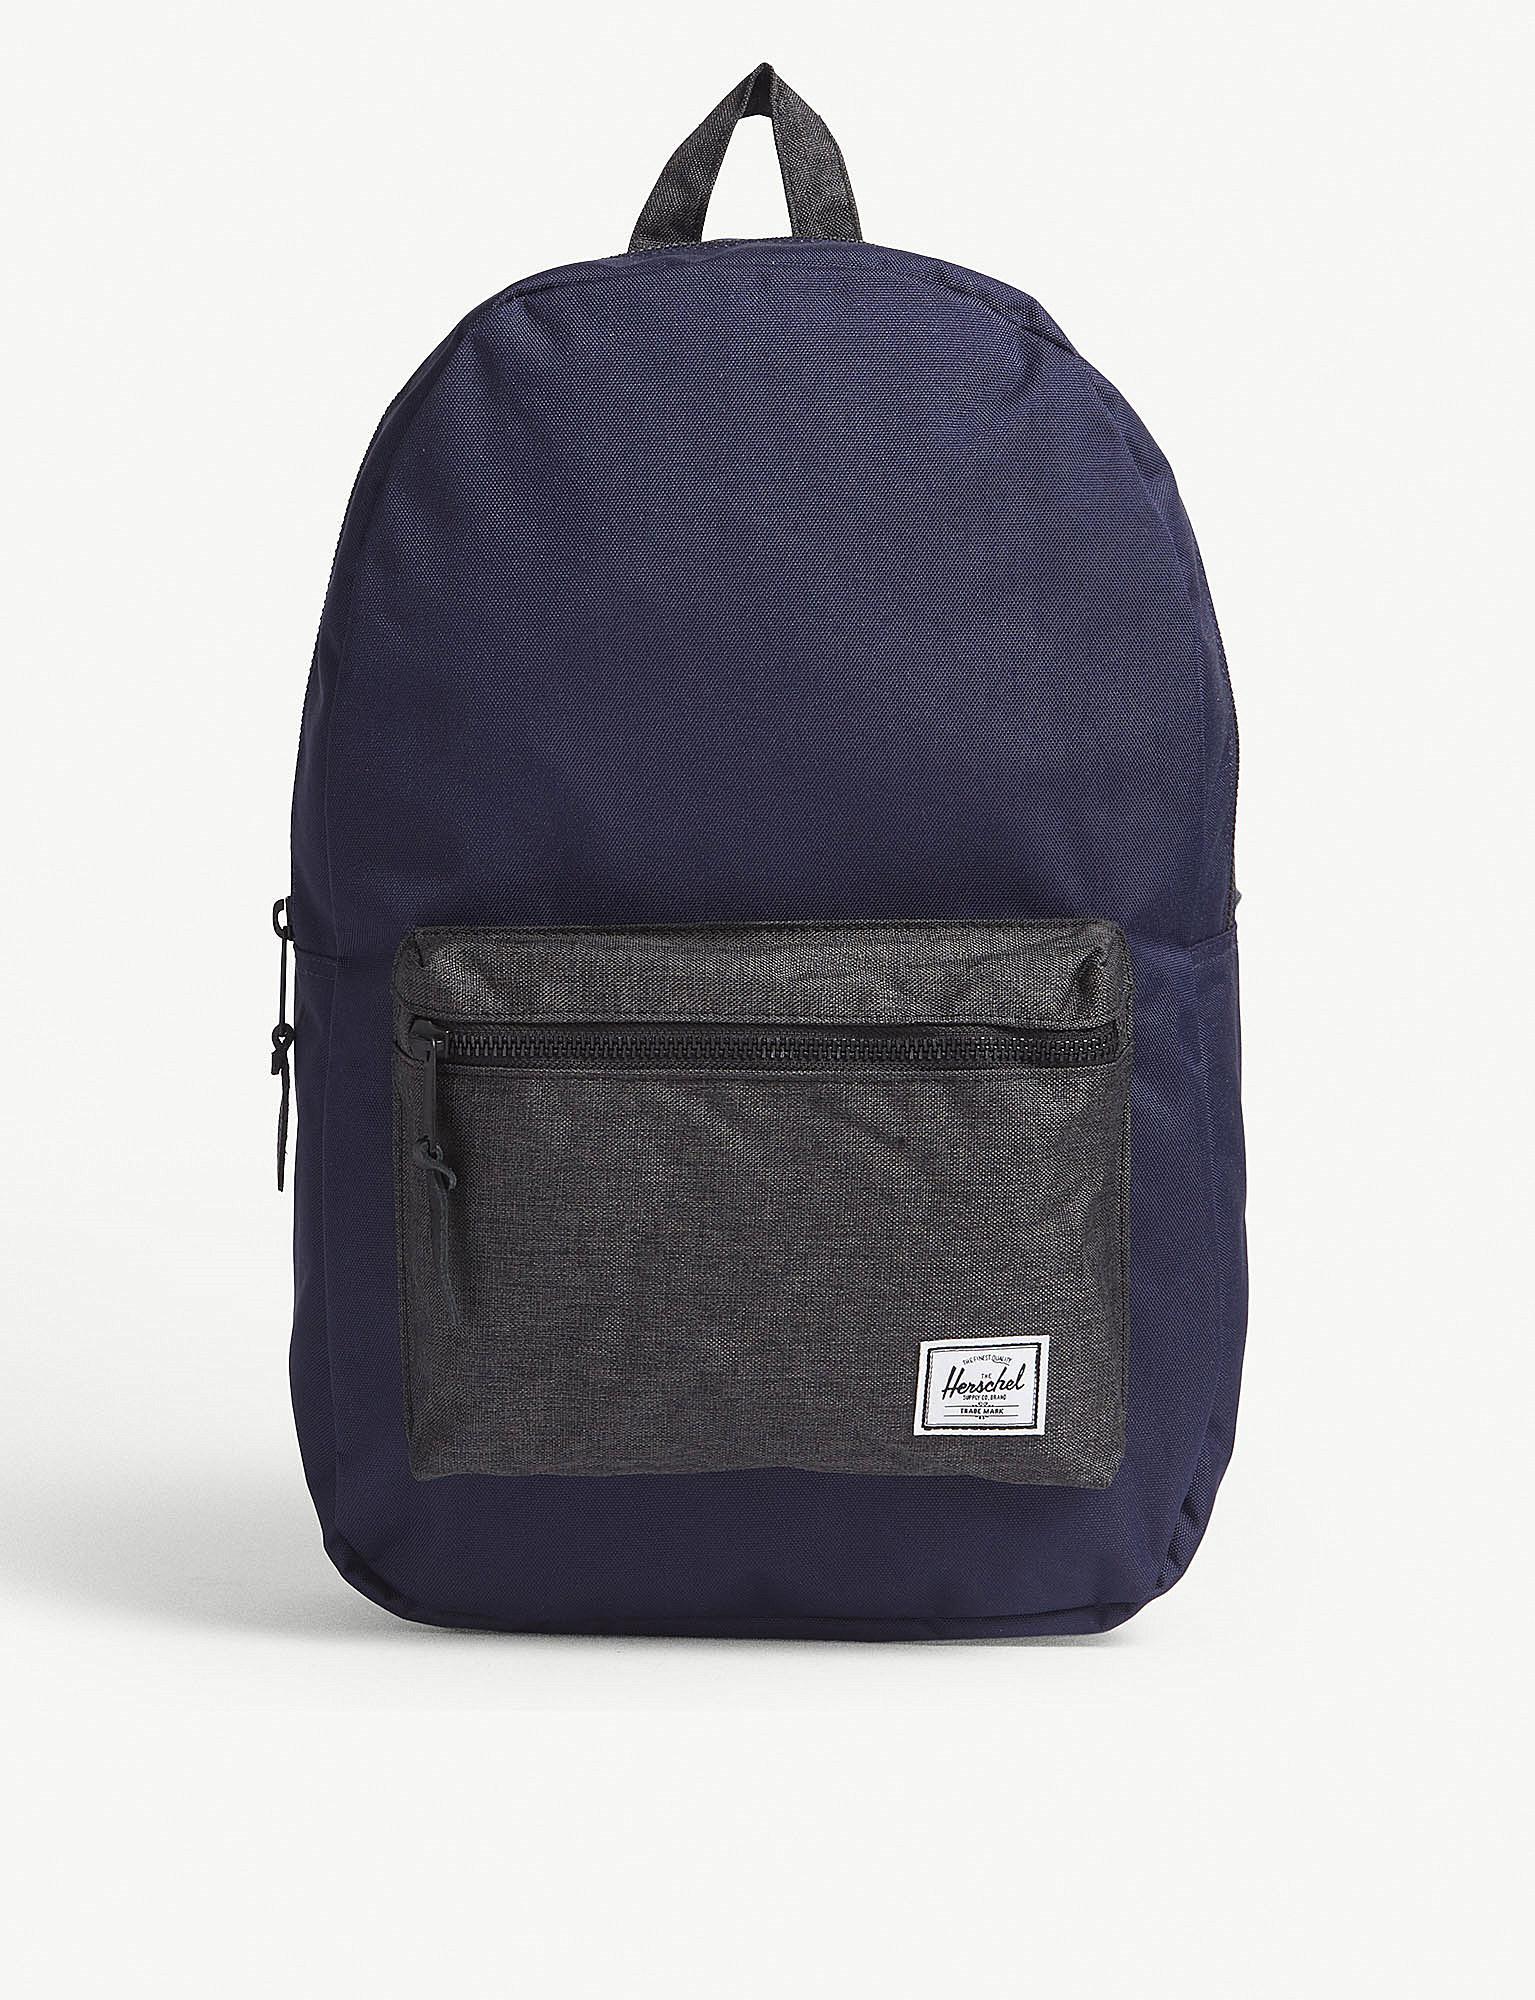 Herschel Supply Co. Settlement Backpack in Navy (Blue) for Men